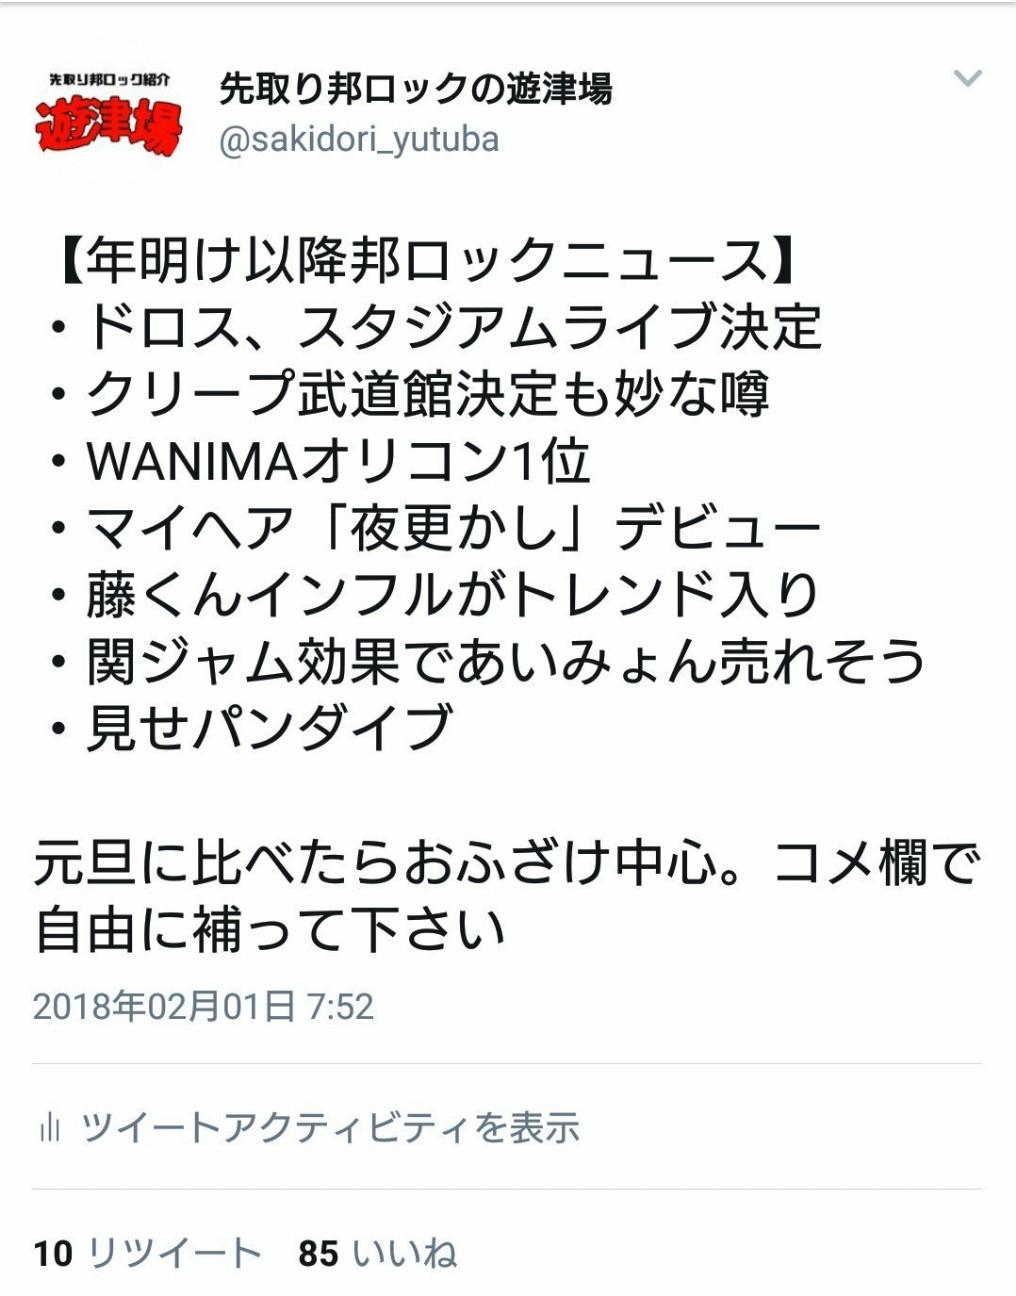 f:id:sakidoriyutsubarock:20181213223423j:plain